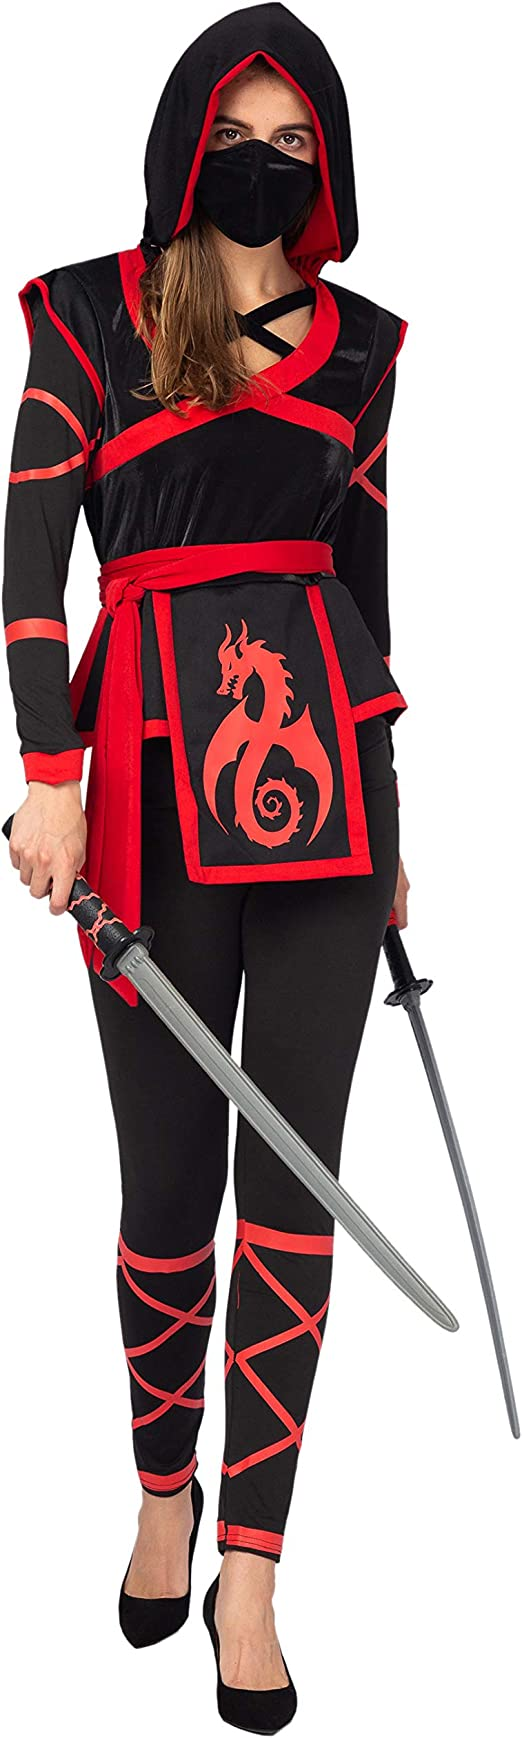 Amazon.com: Spooktacular Creations Disfraz de guerrero ninja ...